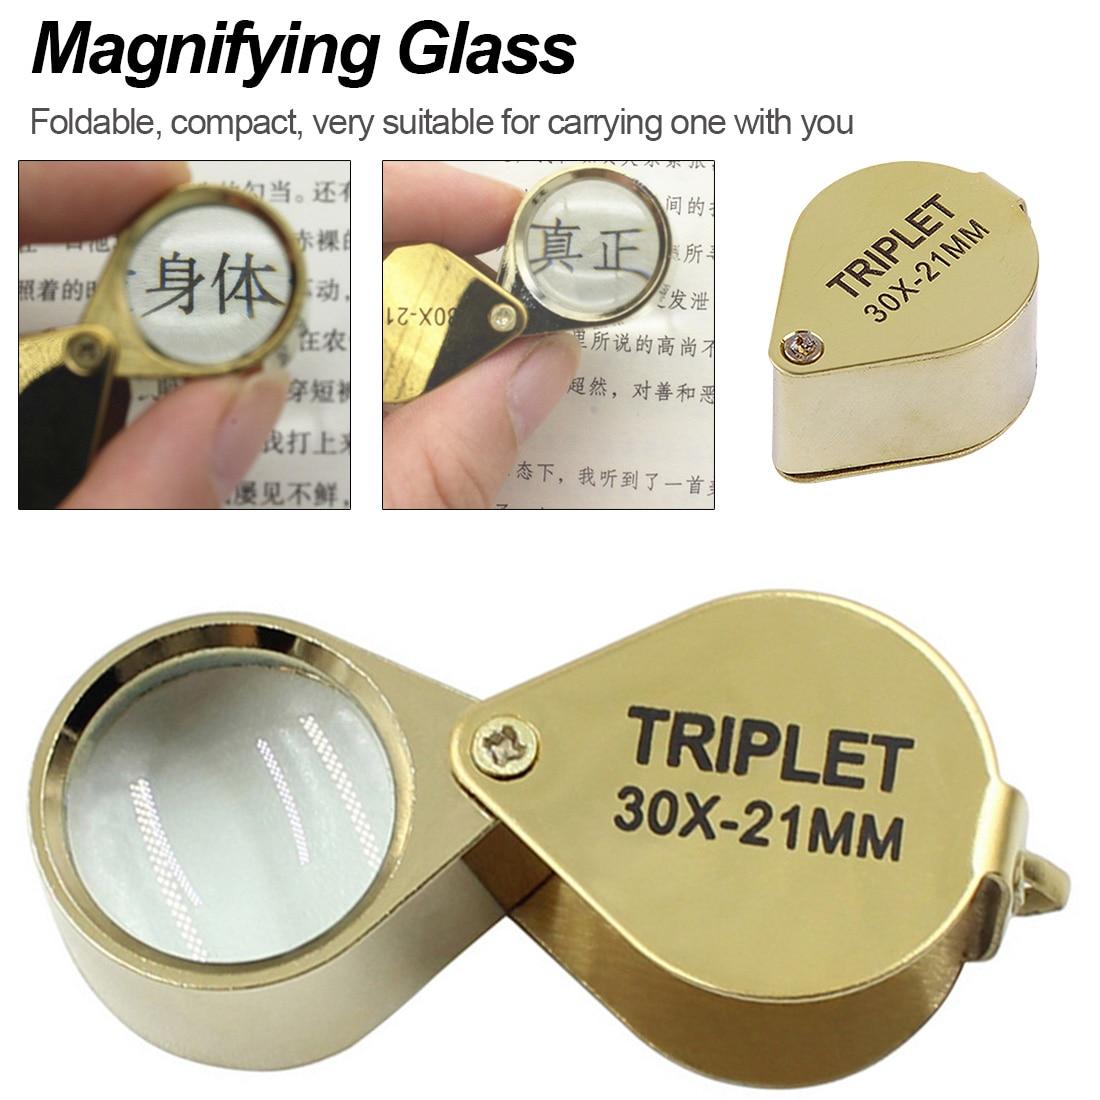 Lupa lupa de cristal óptico de Ojos de joyeros lupa de luz LED Mini lupa de plástico lente de mano 30X/ 40X/ 60X aumento